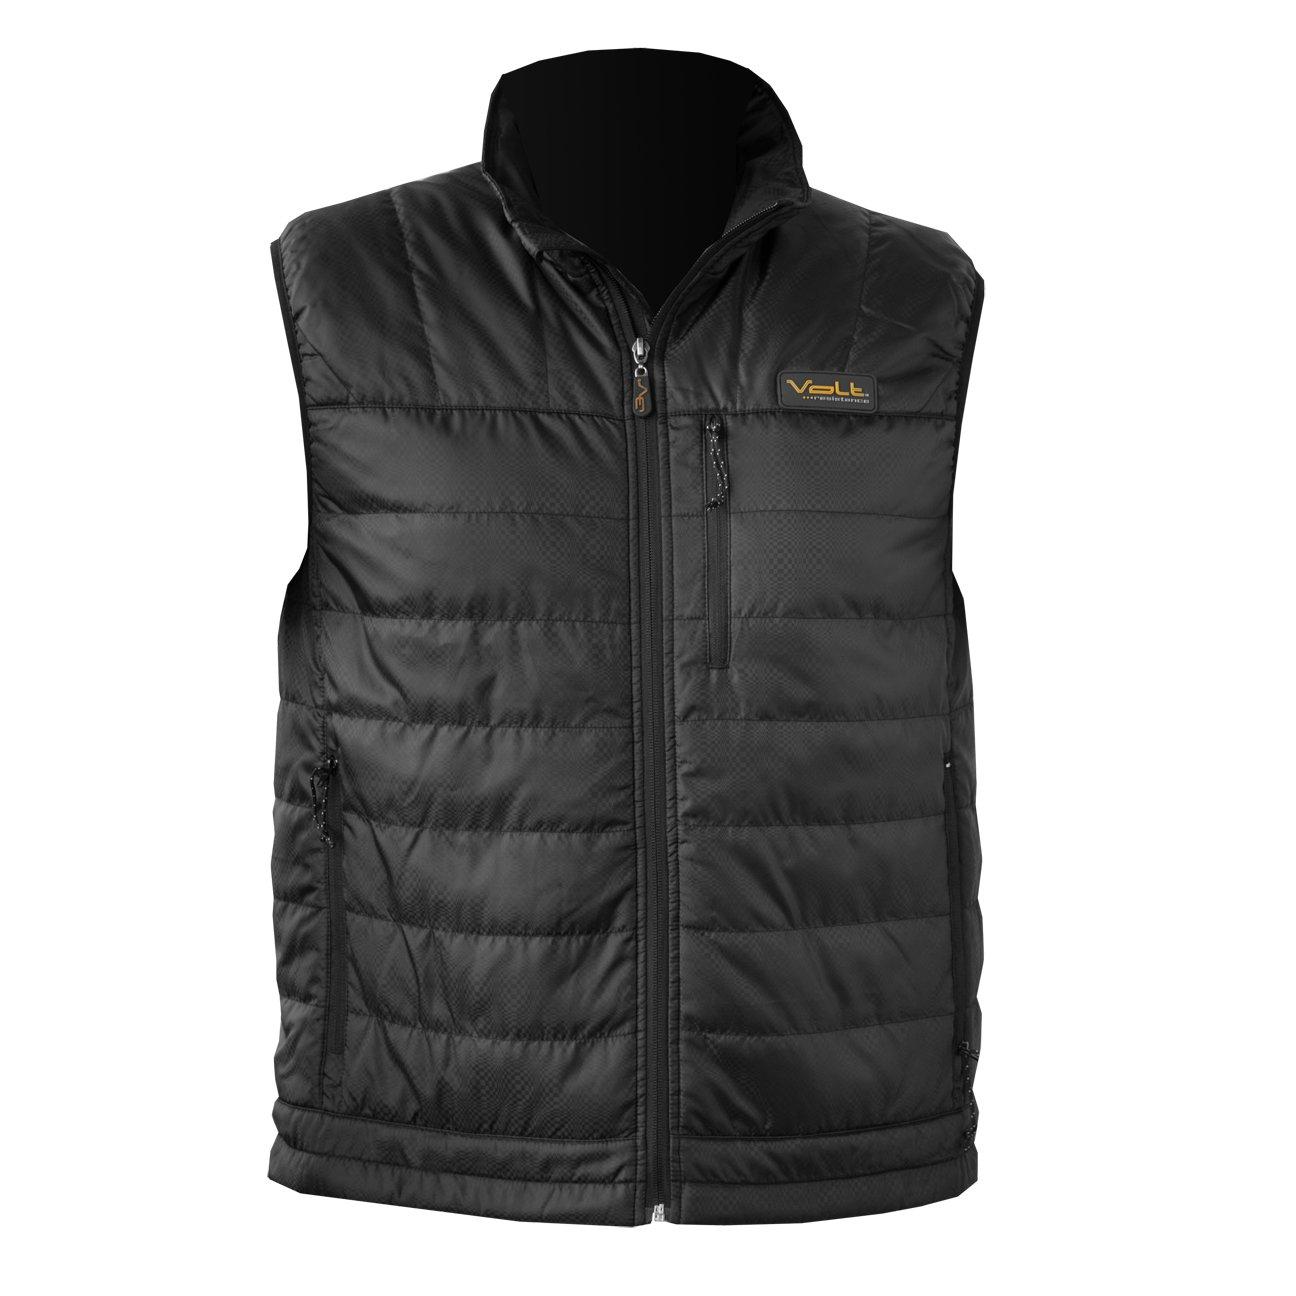 Volt Resistance Mens Insulated Heated Vest Medium Black